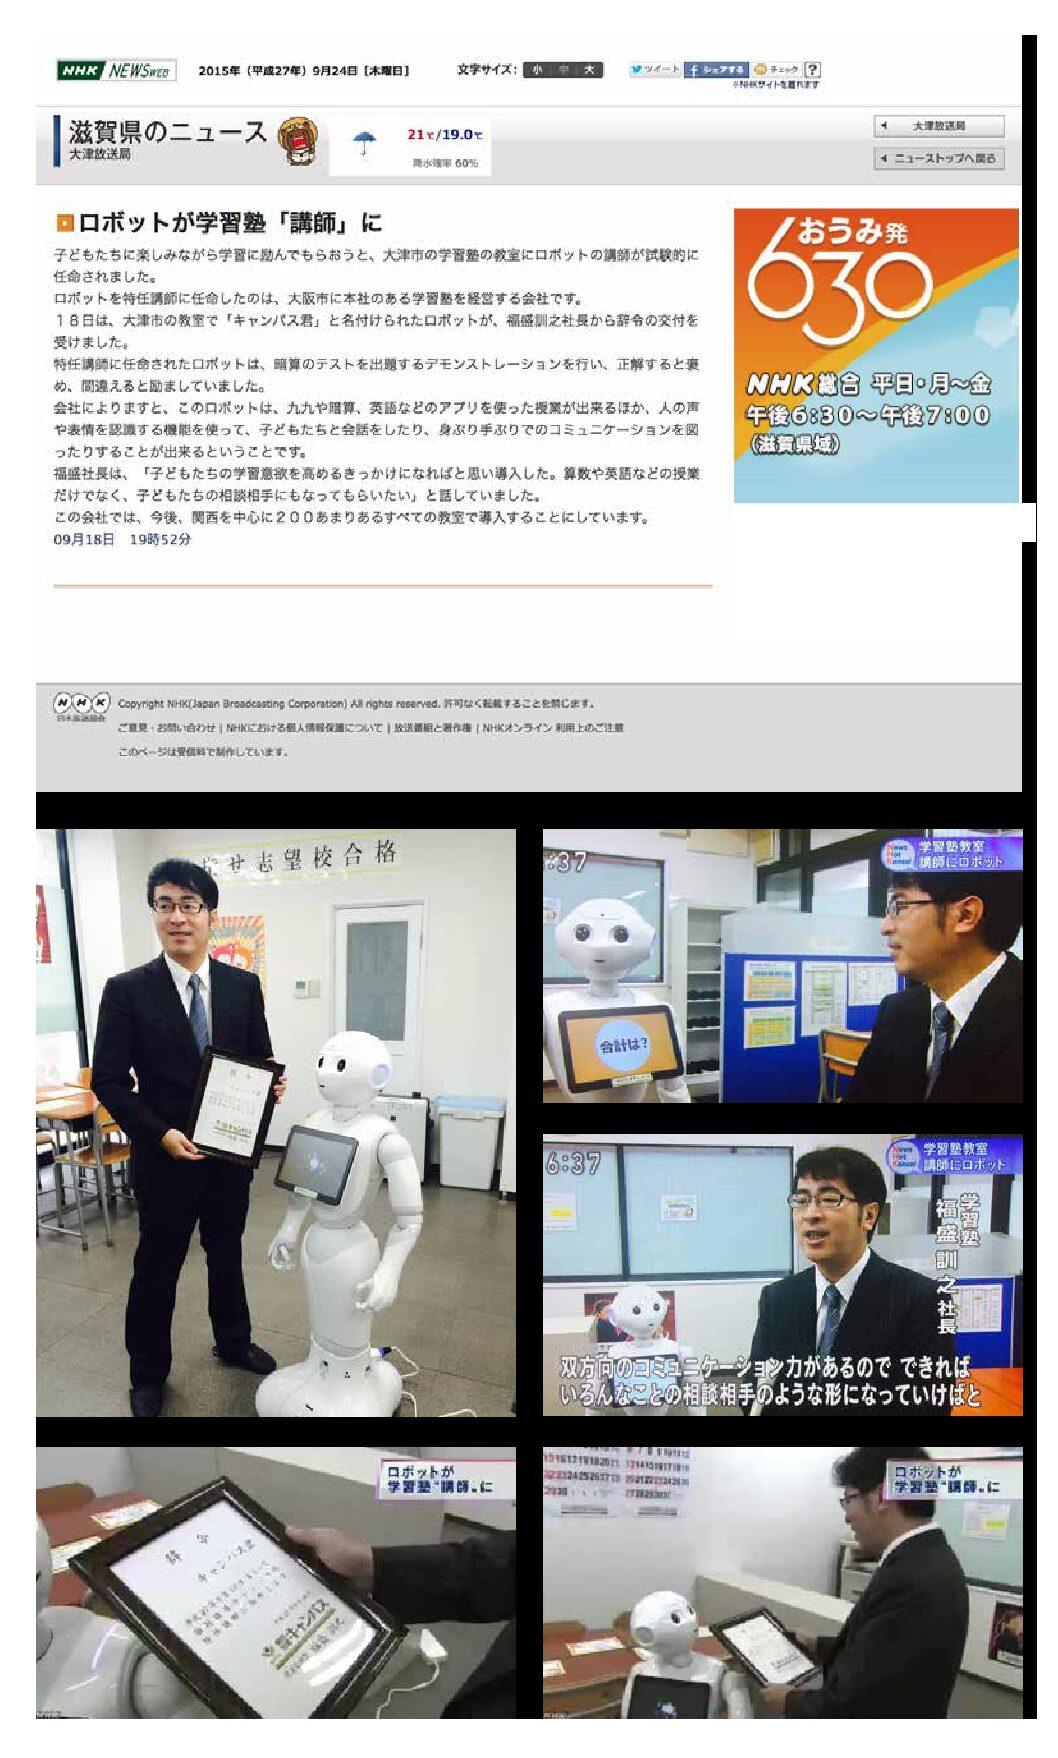 NHK総合滋賀県域「おうみ発630」で特集されました。